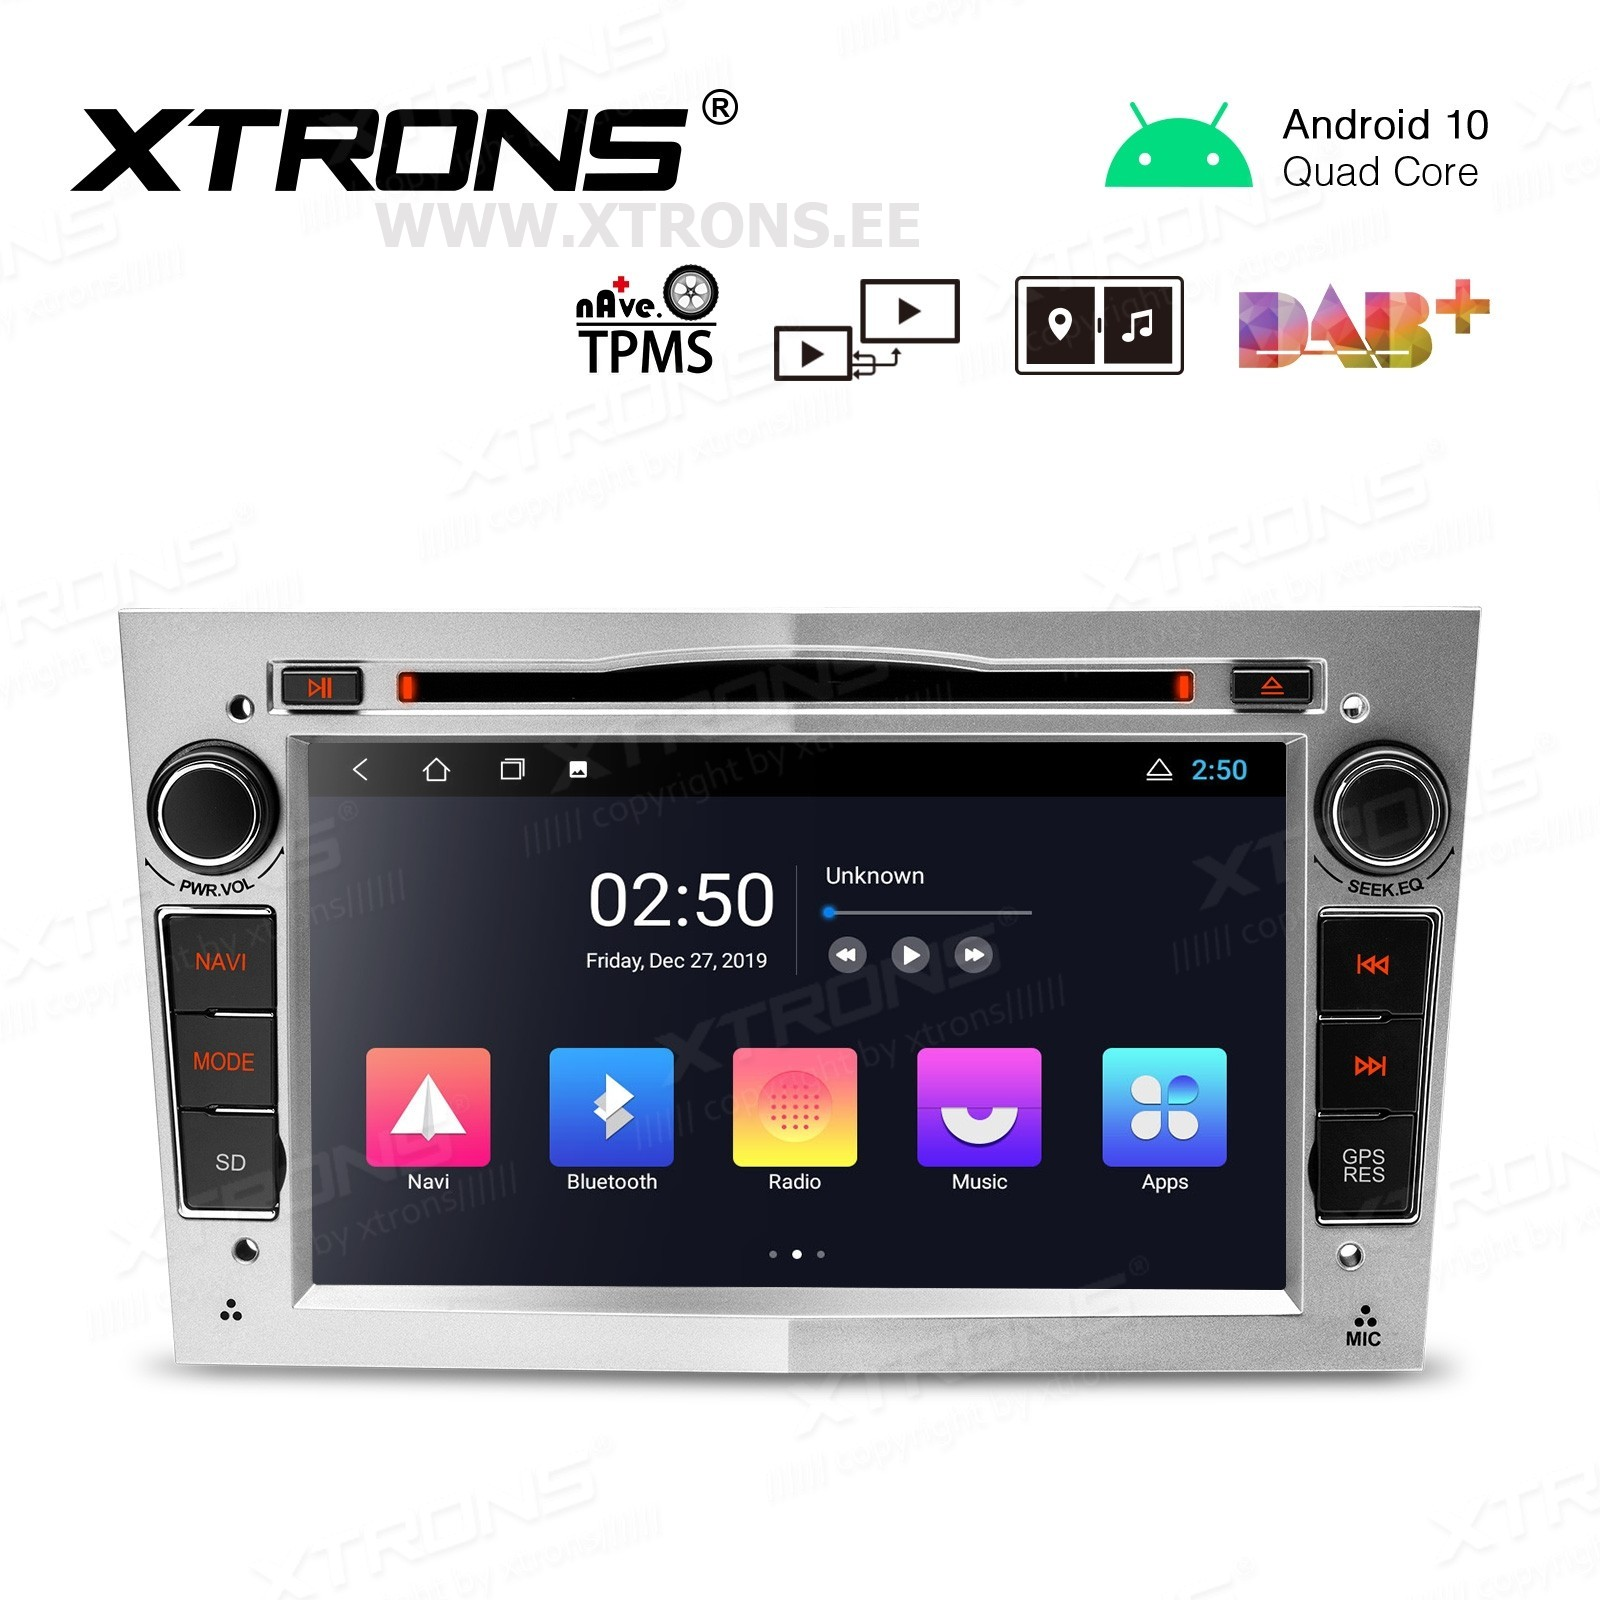 XTRONS PC70VXV-S